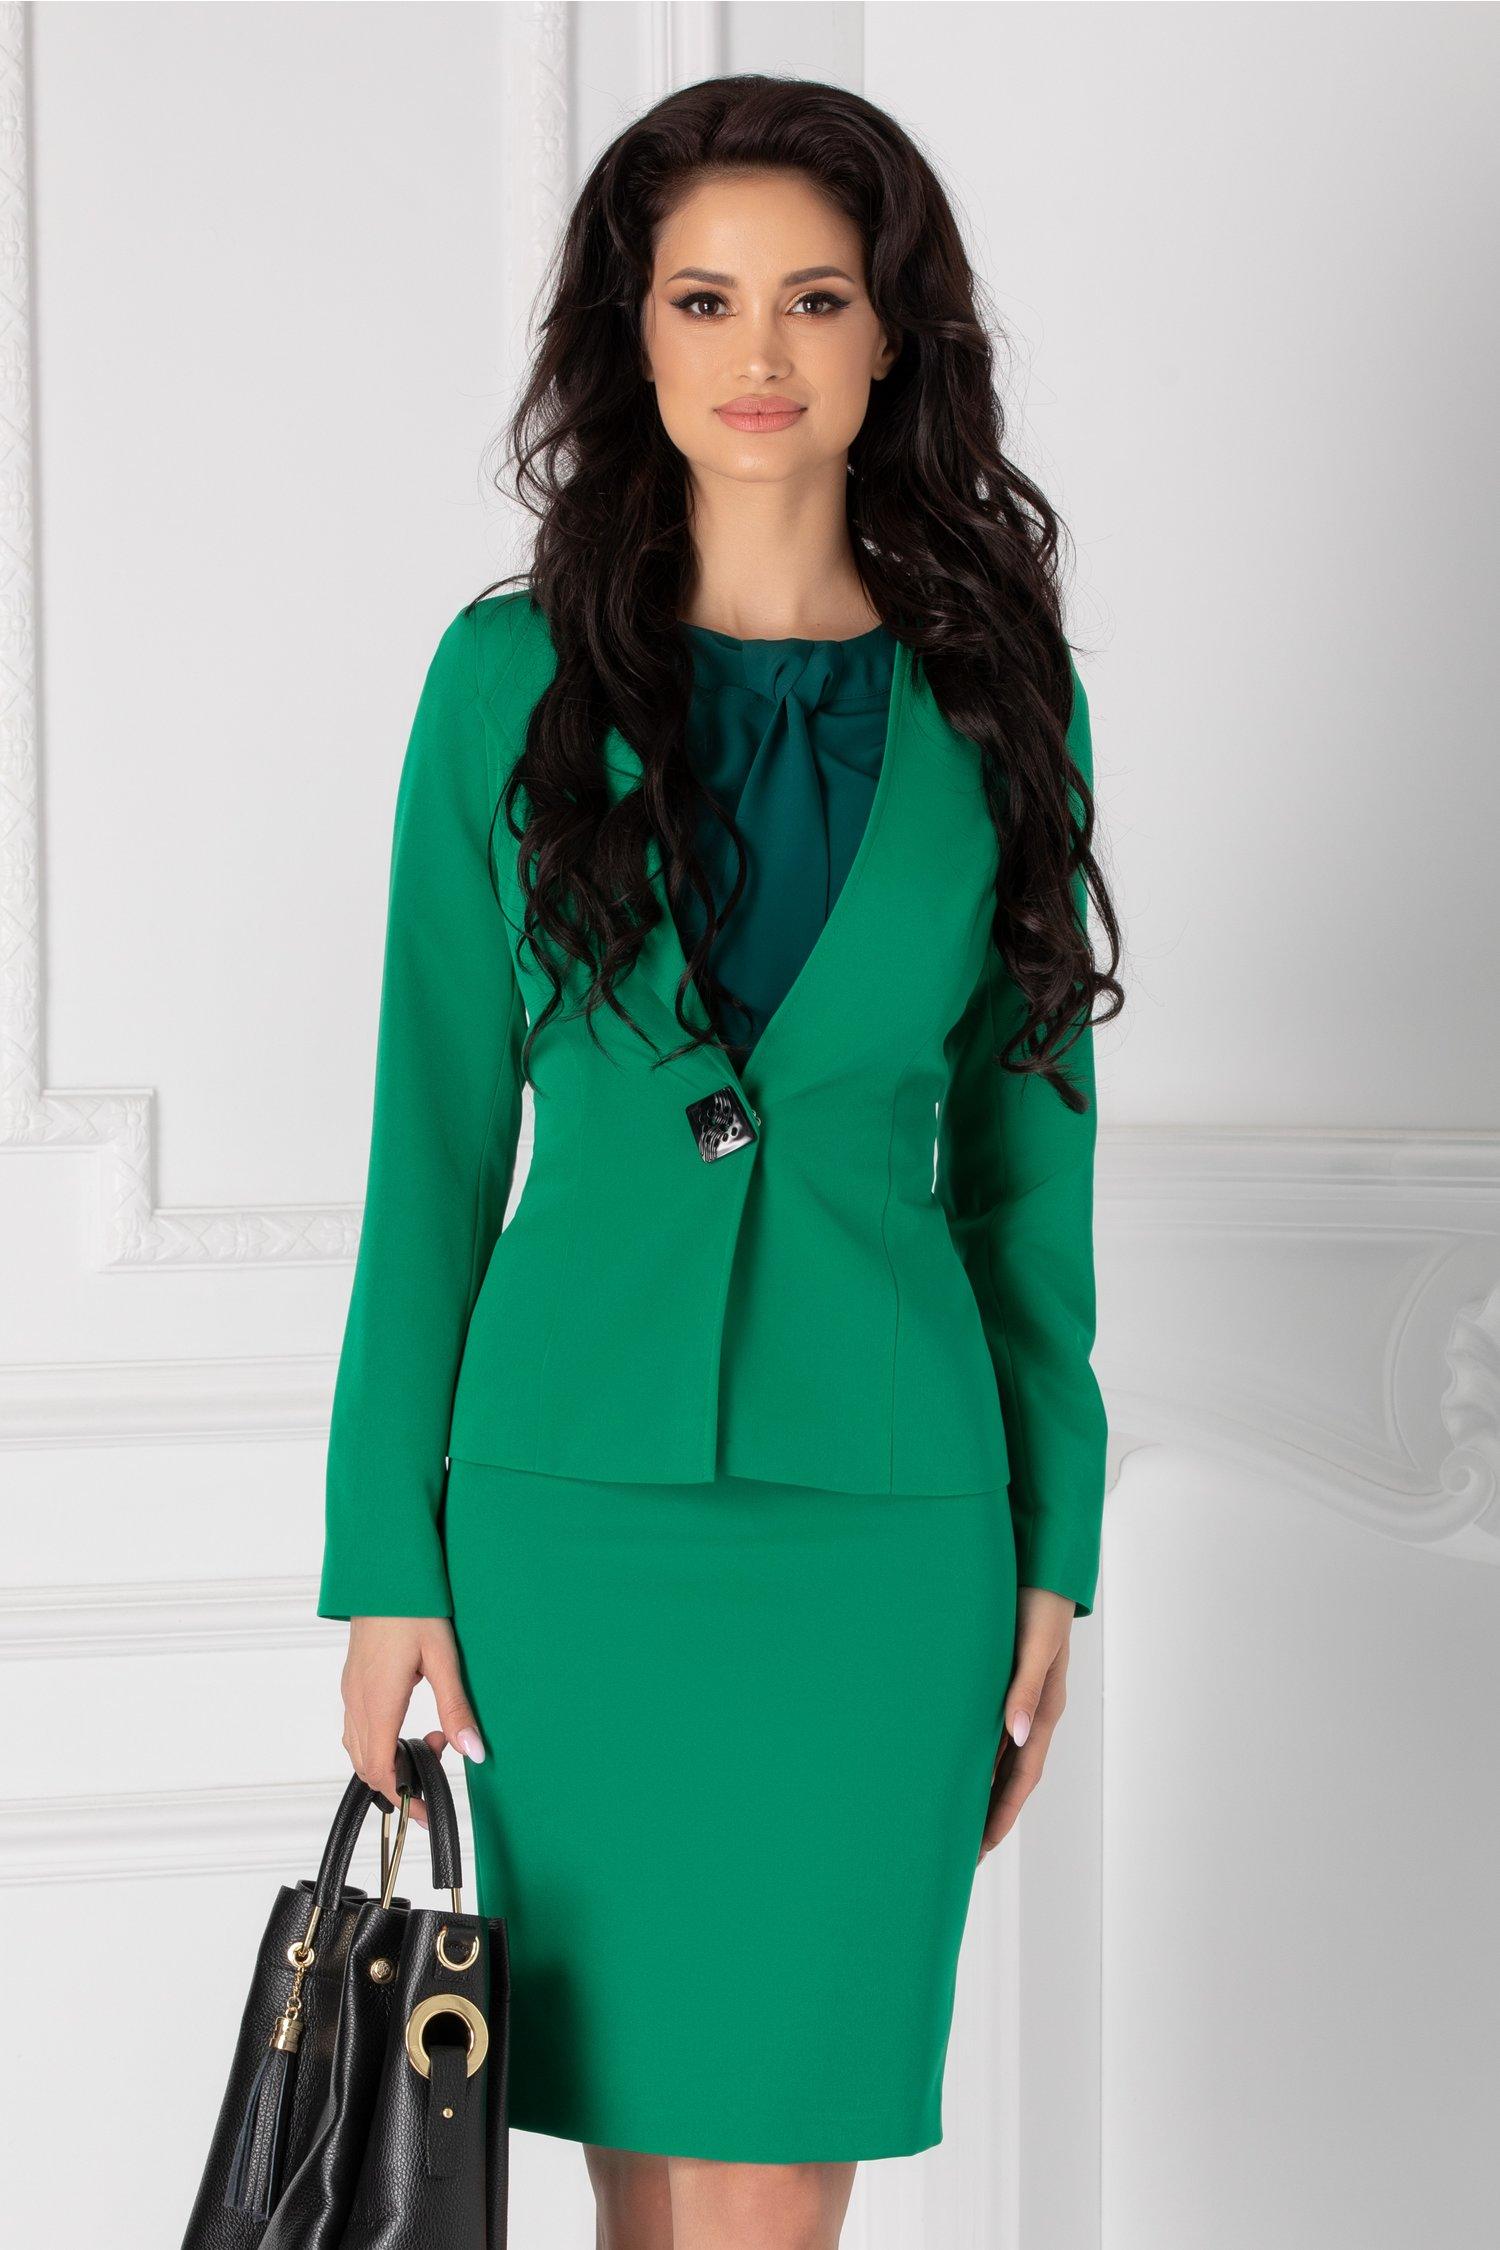 Compleu Leonard Collection verde cu sacou si fusta